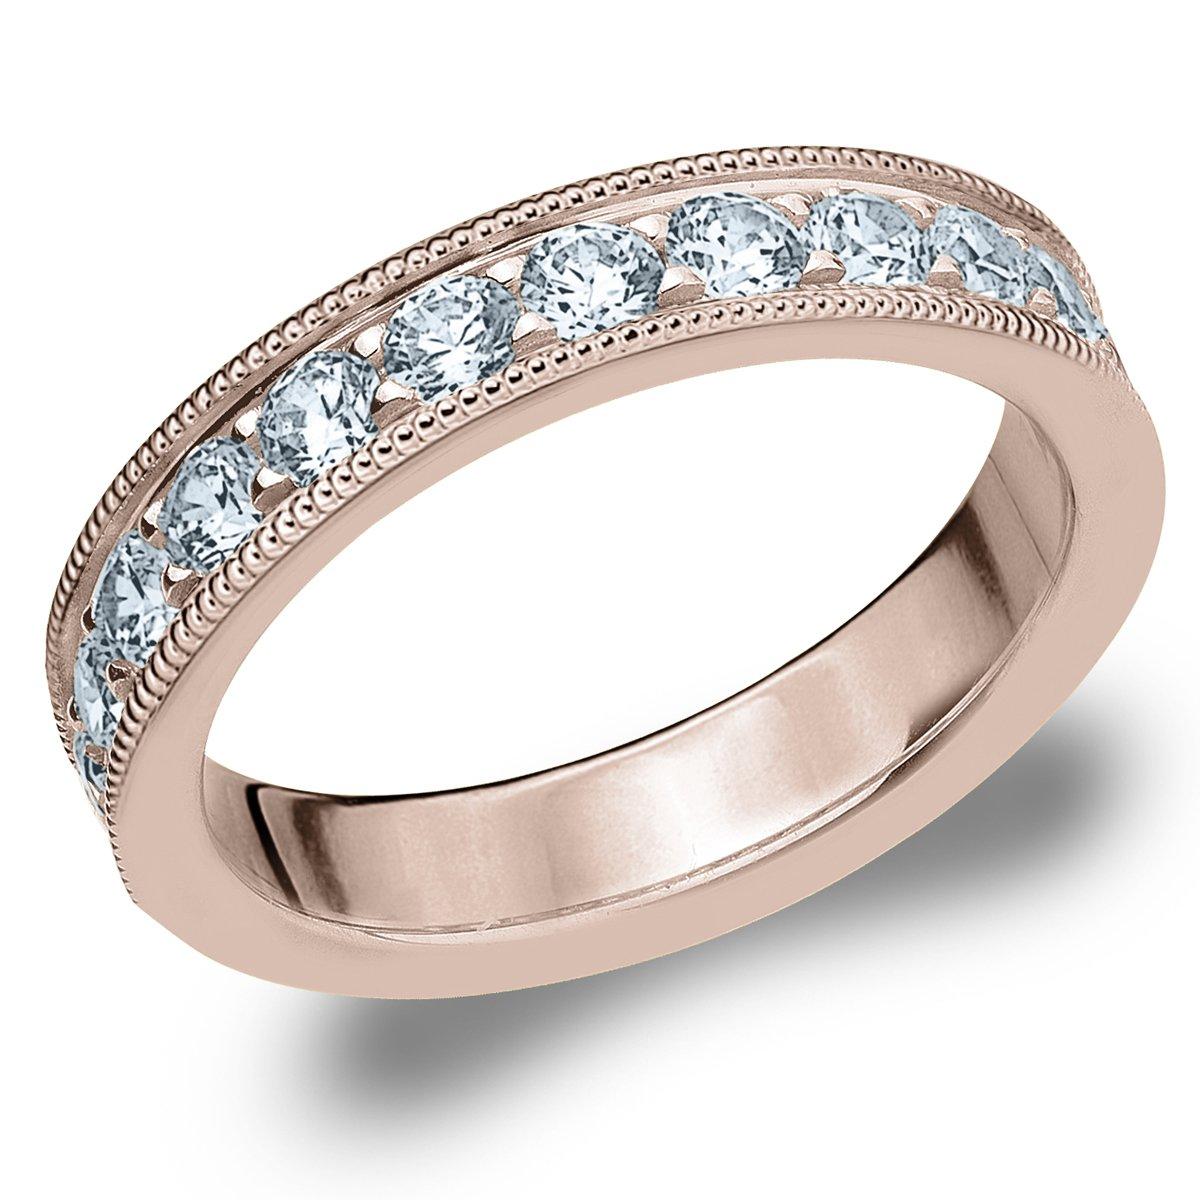 18K Rose Gold Diamond Milgrain Edge Prong Set Ring (1.0 cttw, H-I Color, I1-I2 Clarity) Size 7